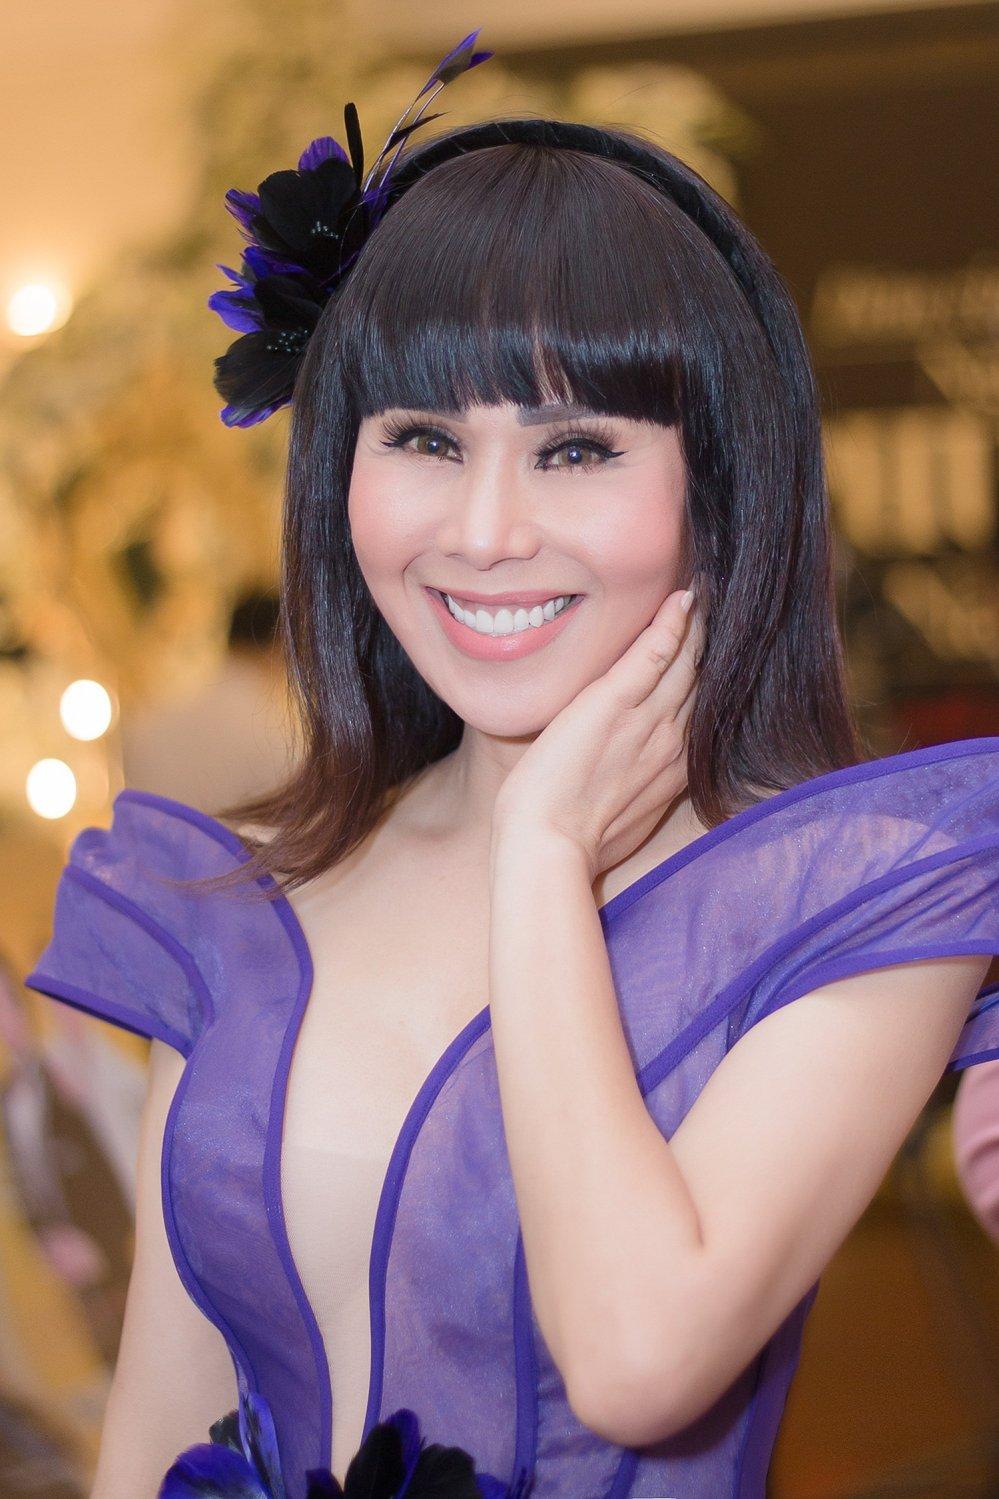 Nhat Kim Anh do nhan sac sexy cung Hoa hau Hang Nguyen, A hau Lien Phuong hinh anh 7